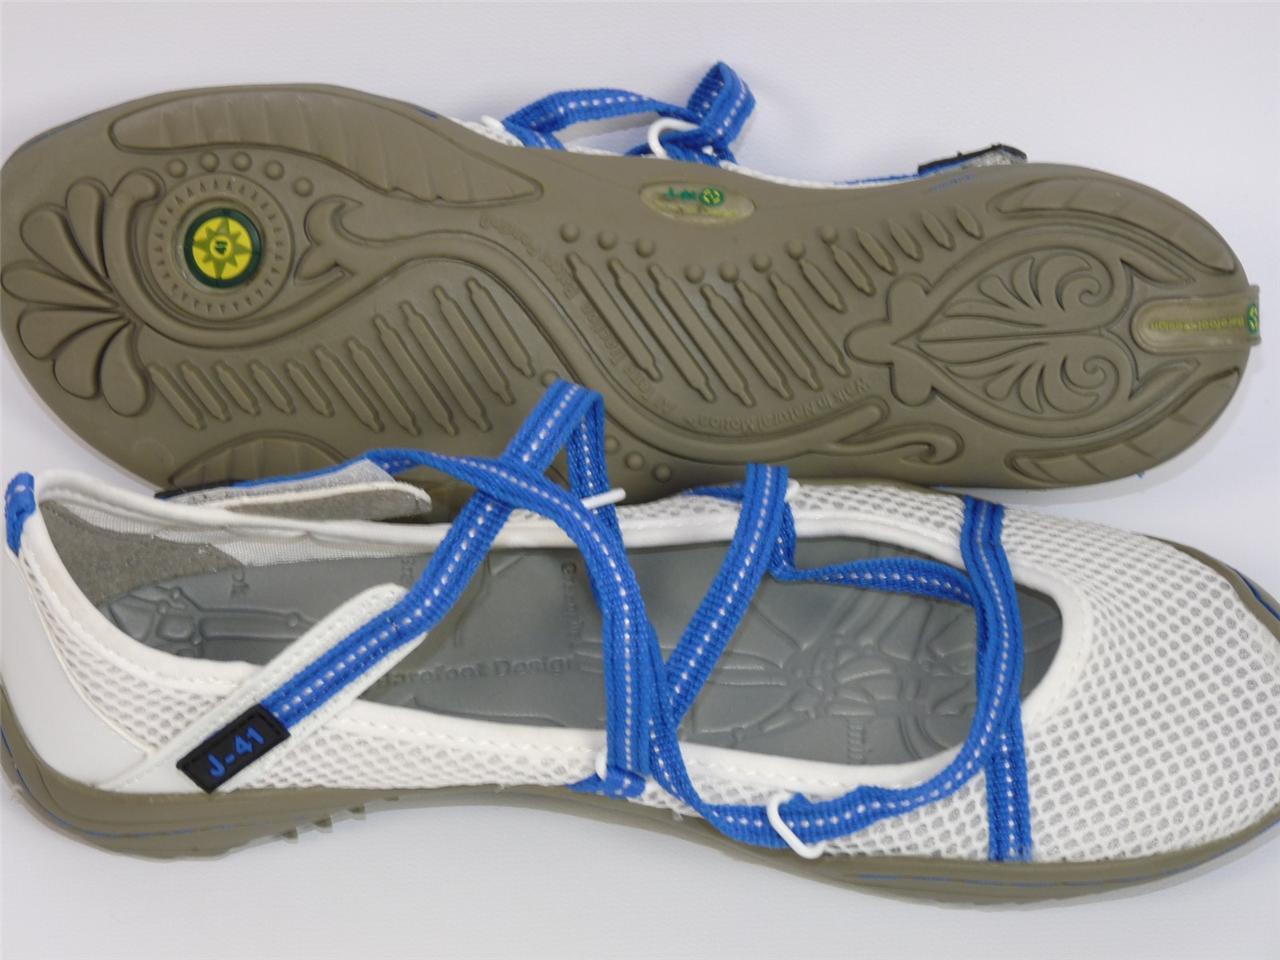 Women's Jambu Vista Hiking Boots